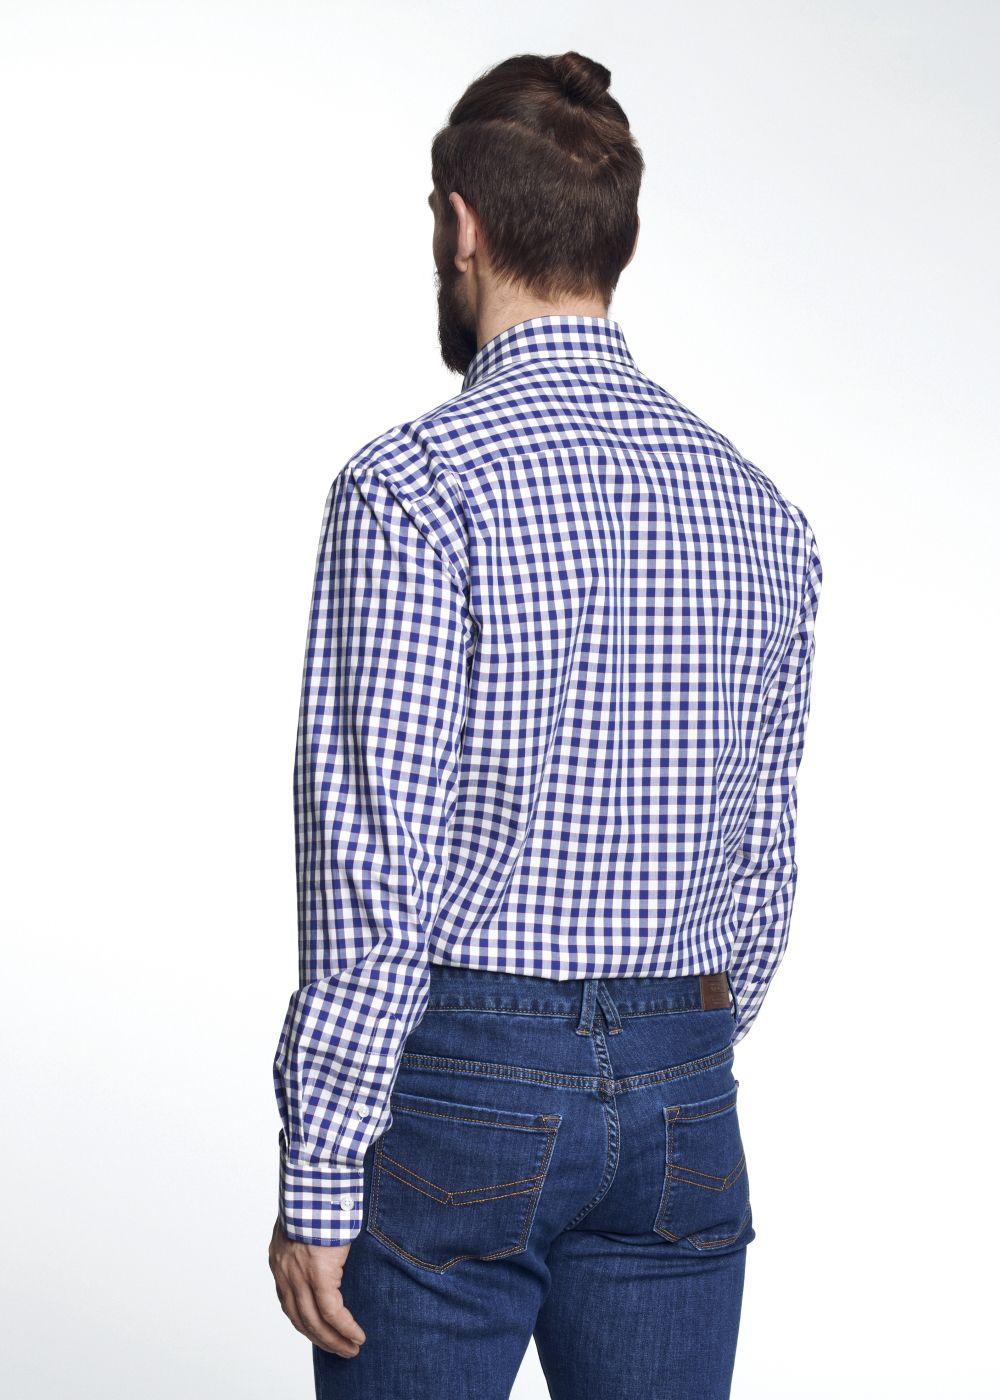 Koszula męska KOSMT-0166-61(W21)